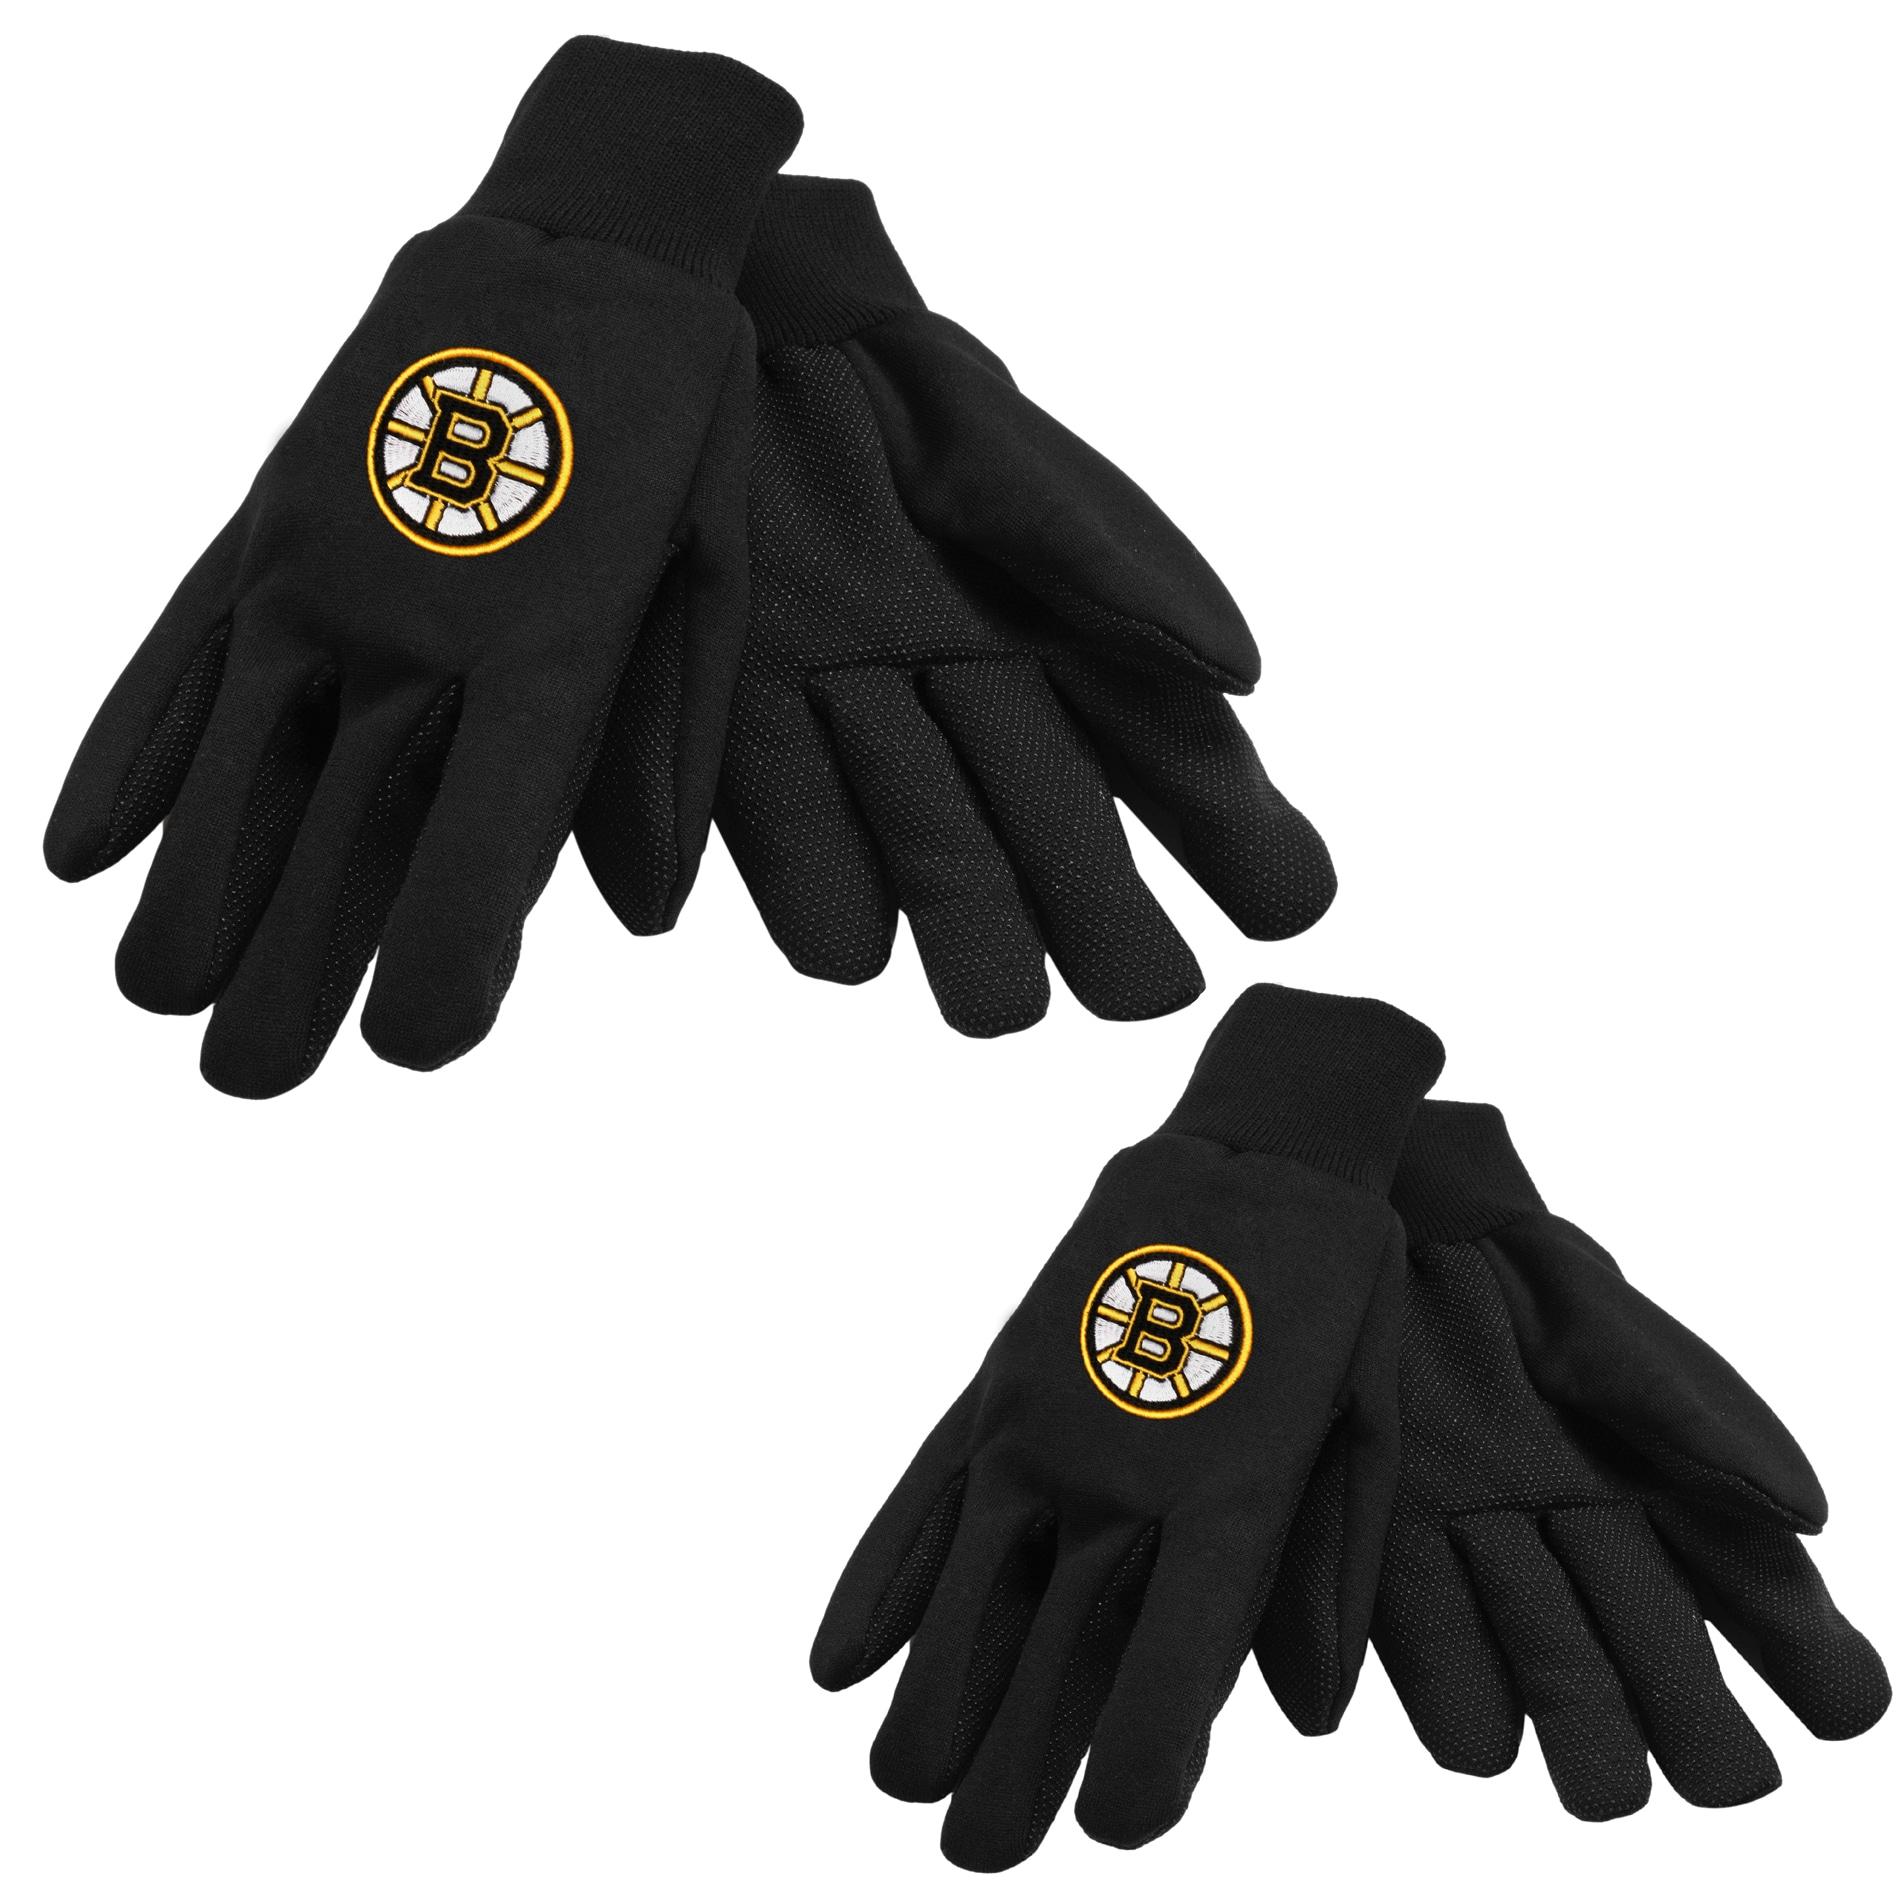 Boston Bruins Two-tone Work Gloves (Set of 2 Pair)